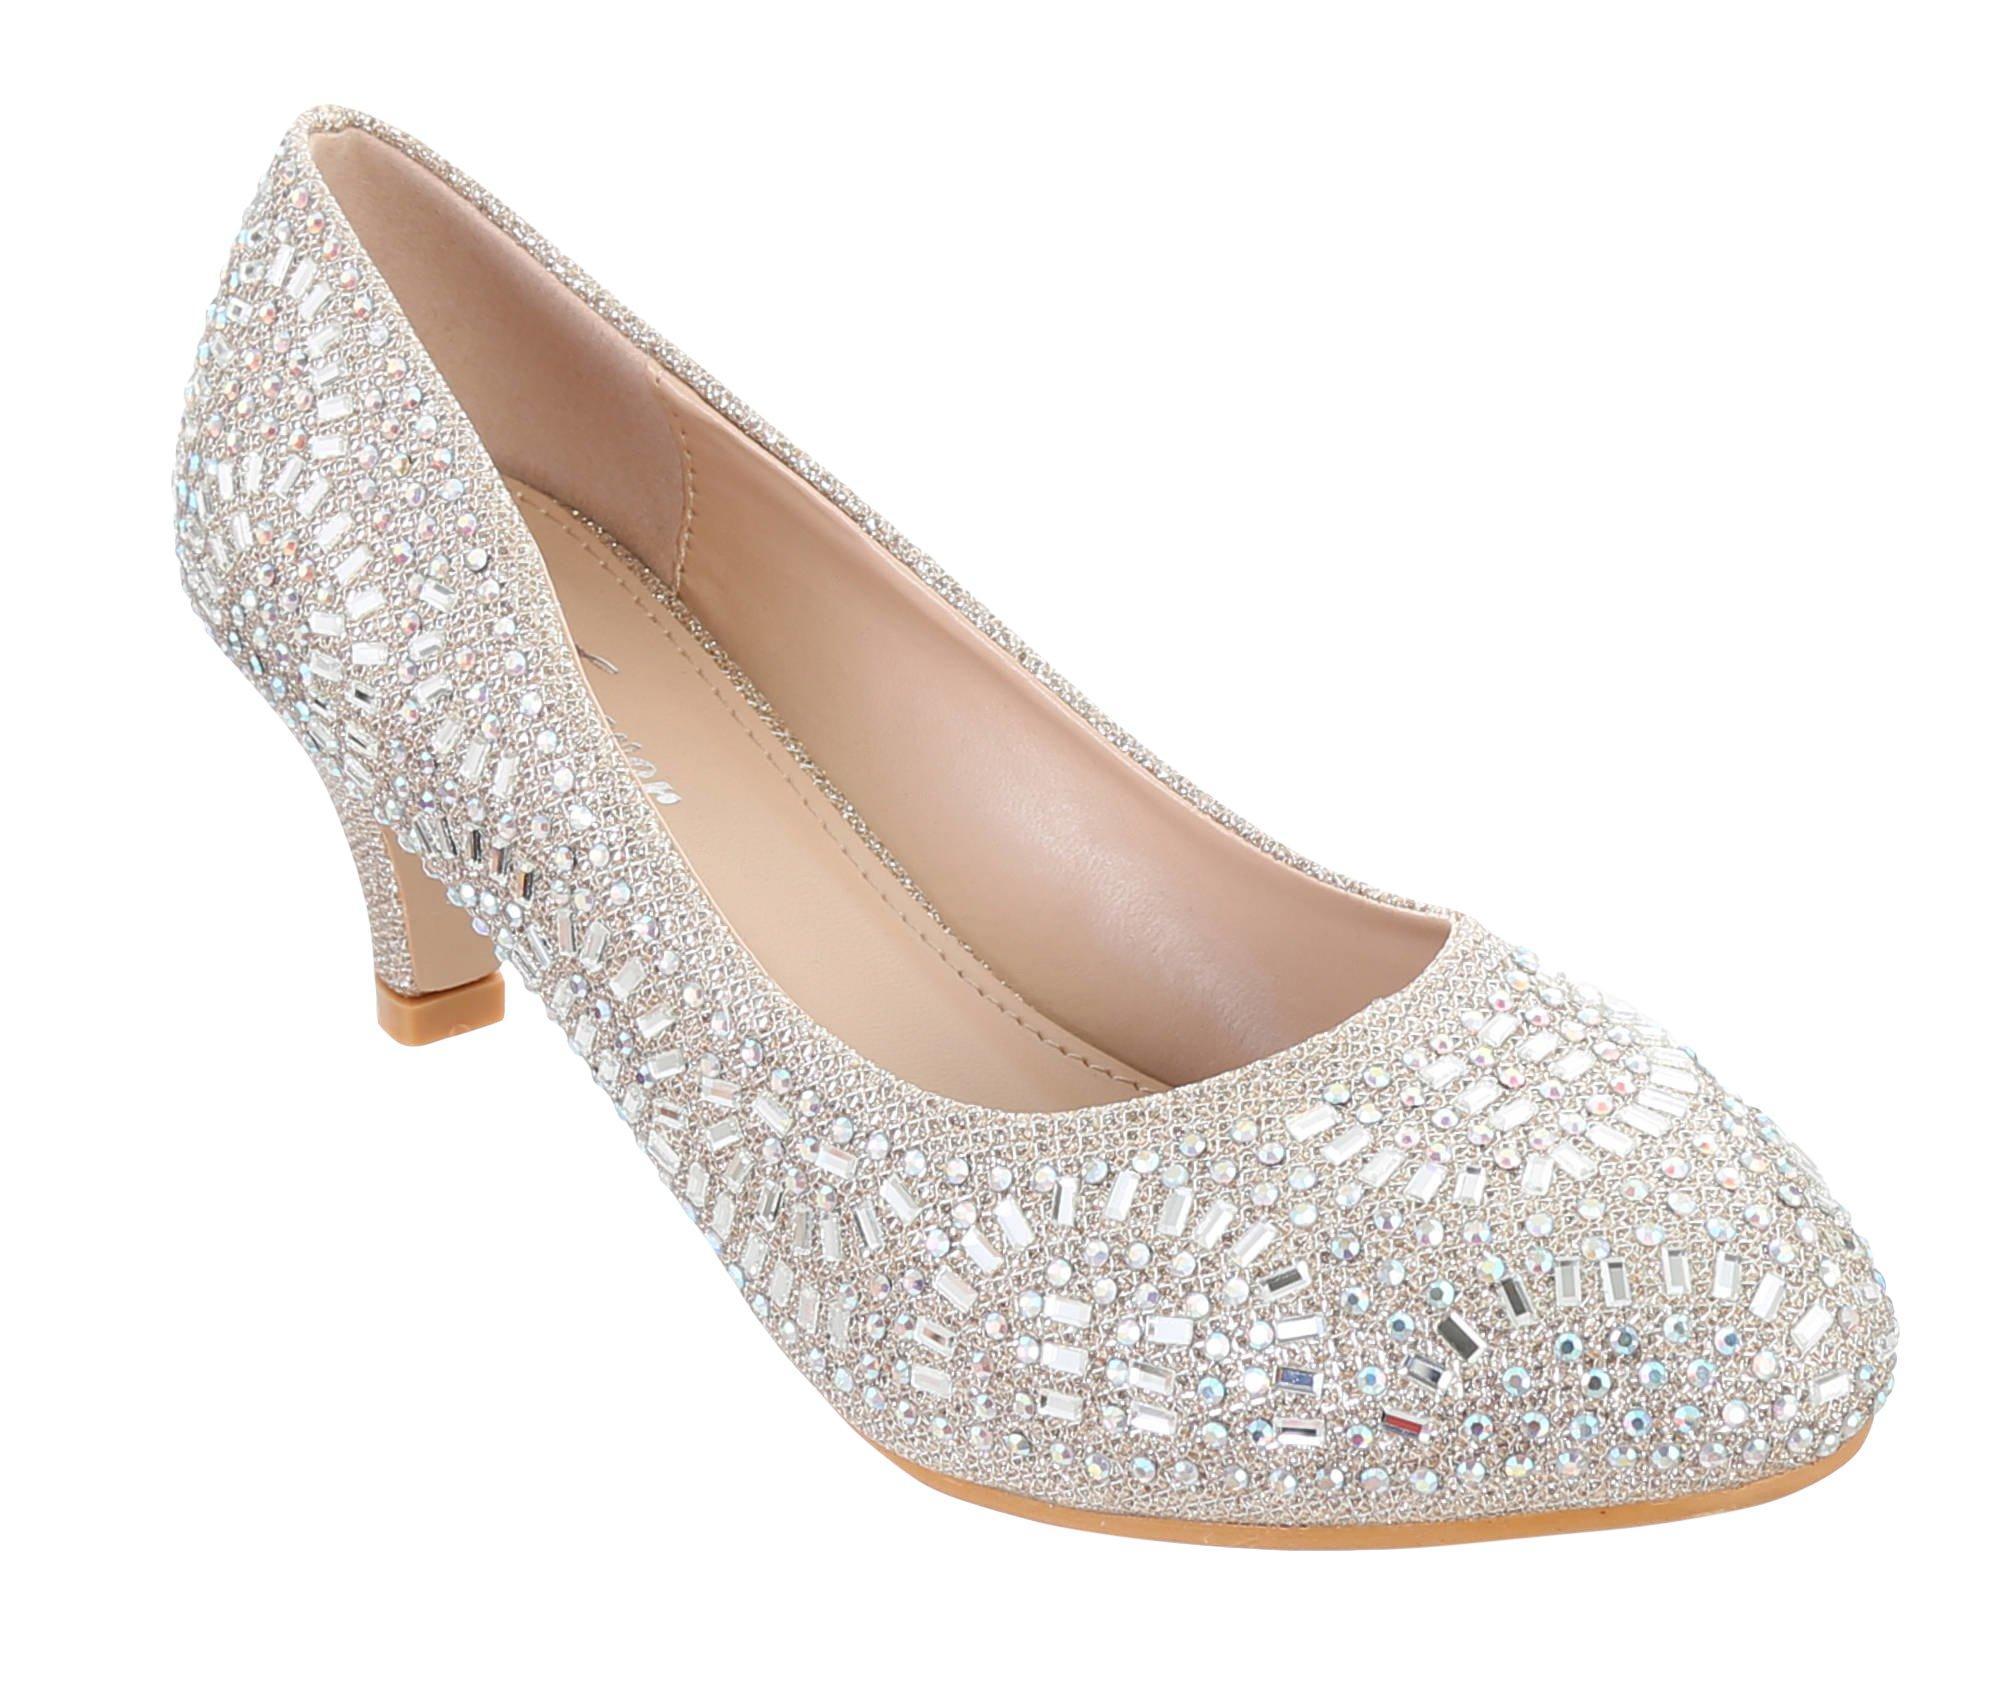 fa6511655b2 Forever. Jemma Jeweled Heels - Champagne